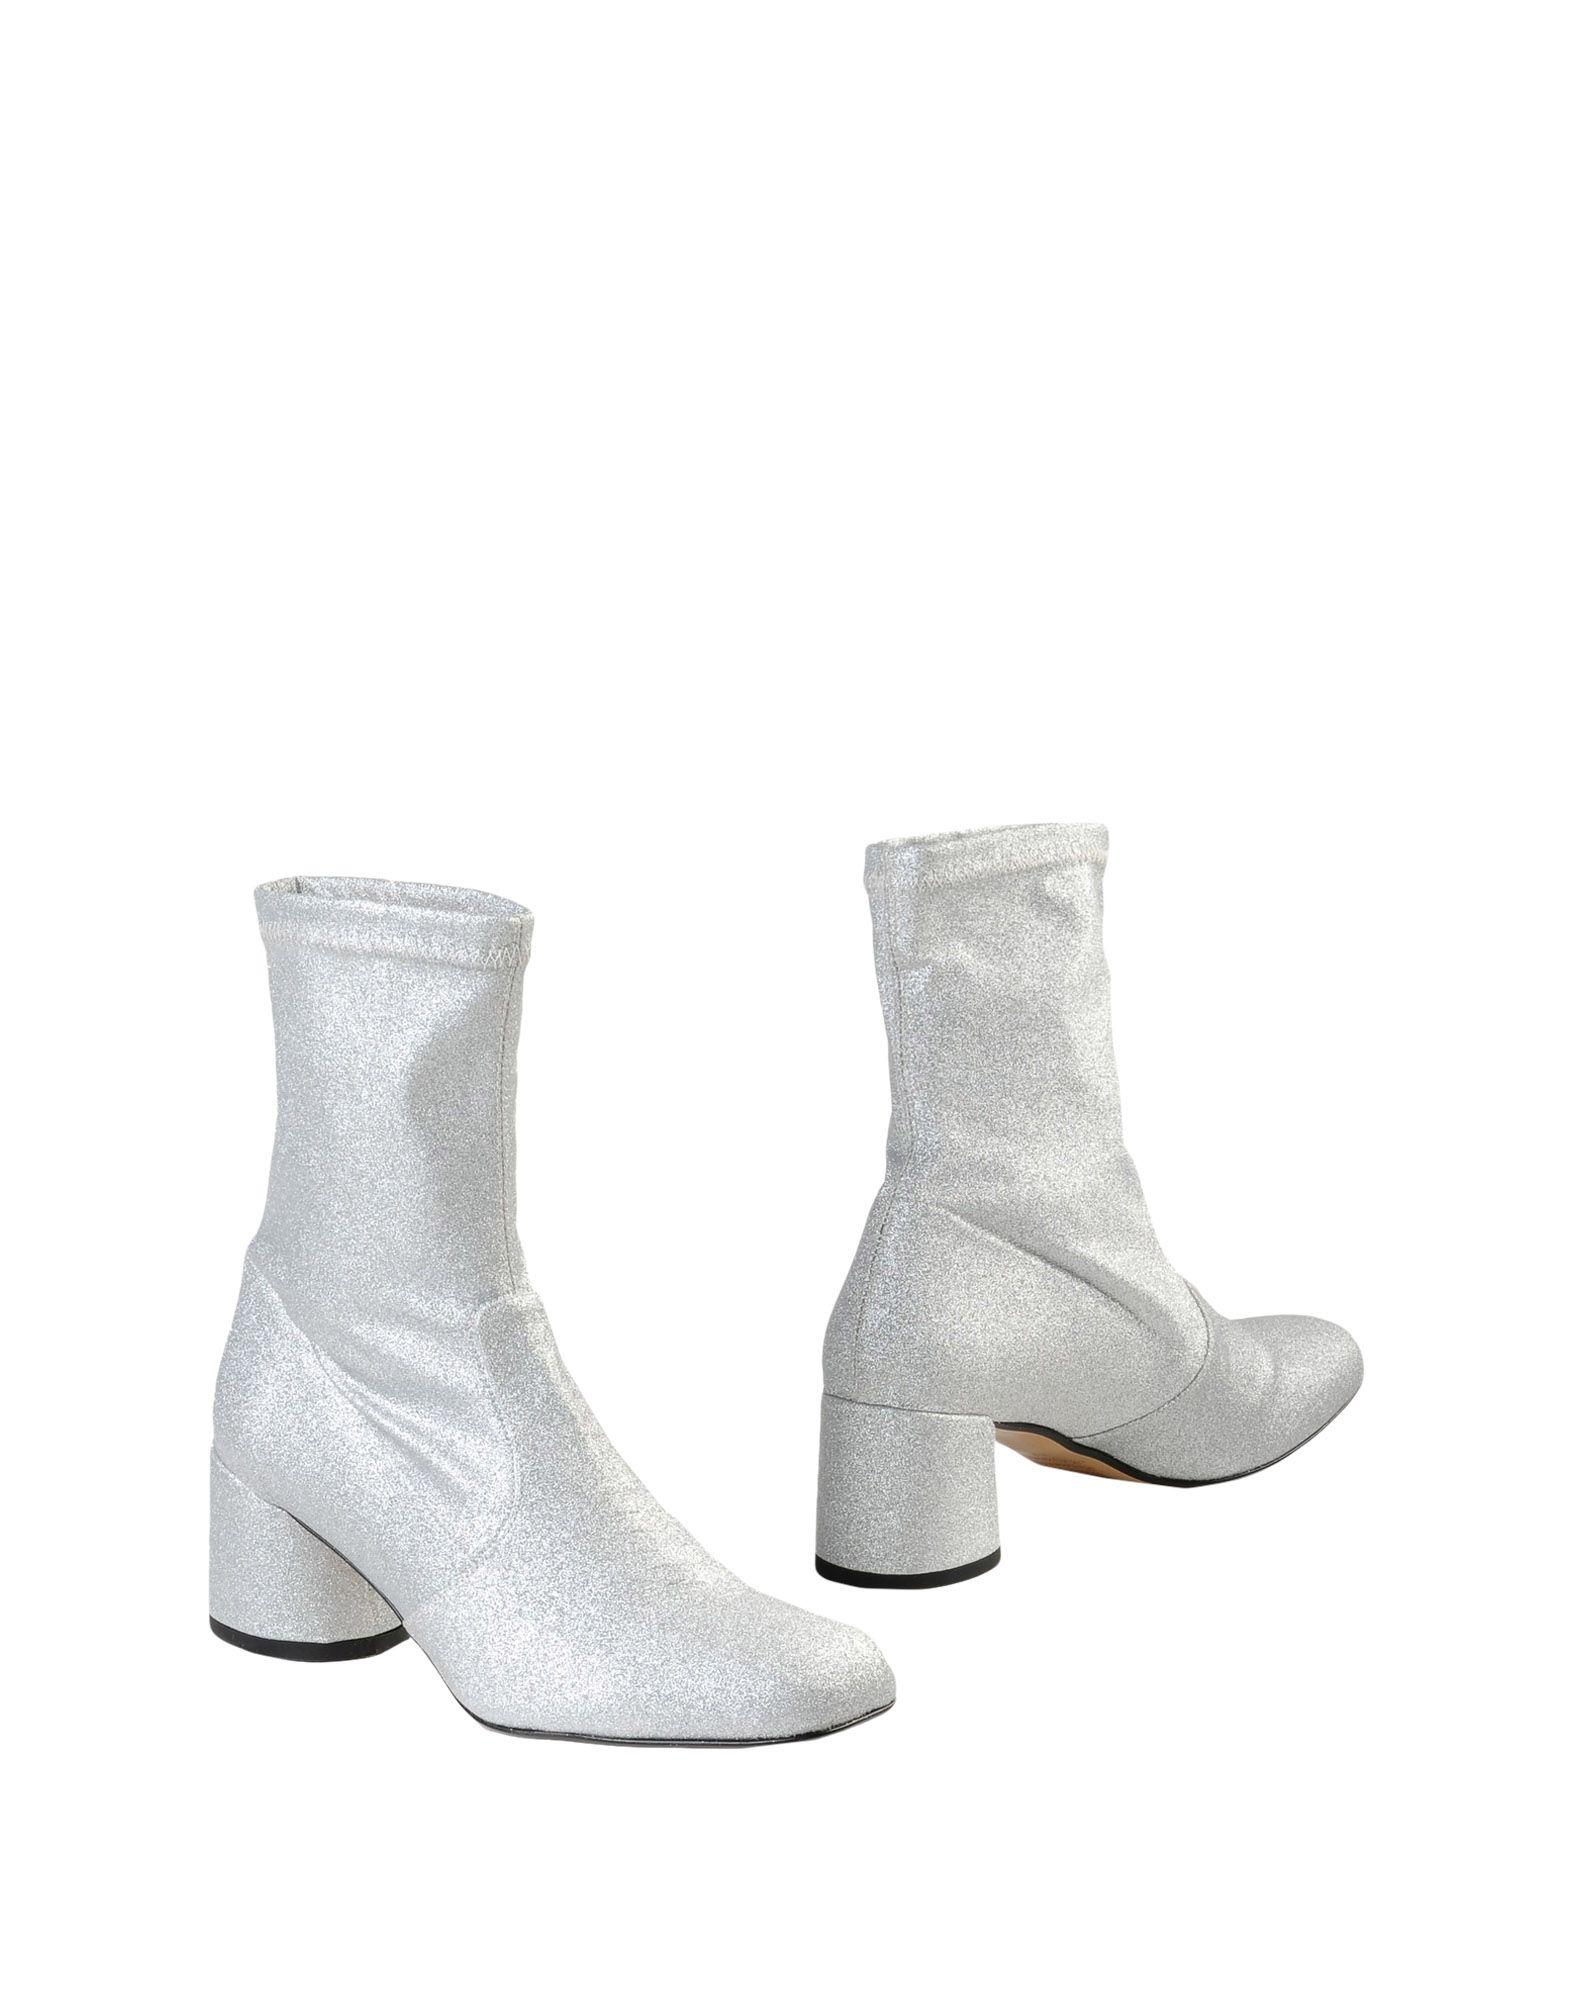 Stilvolle billige Schuhe George J. Love Stiefelette Damen  11537660JW